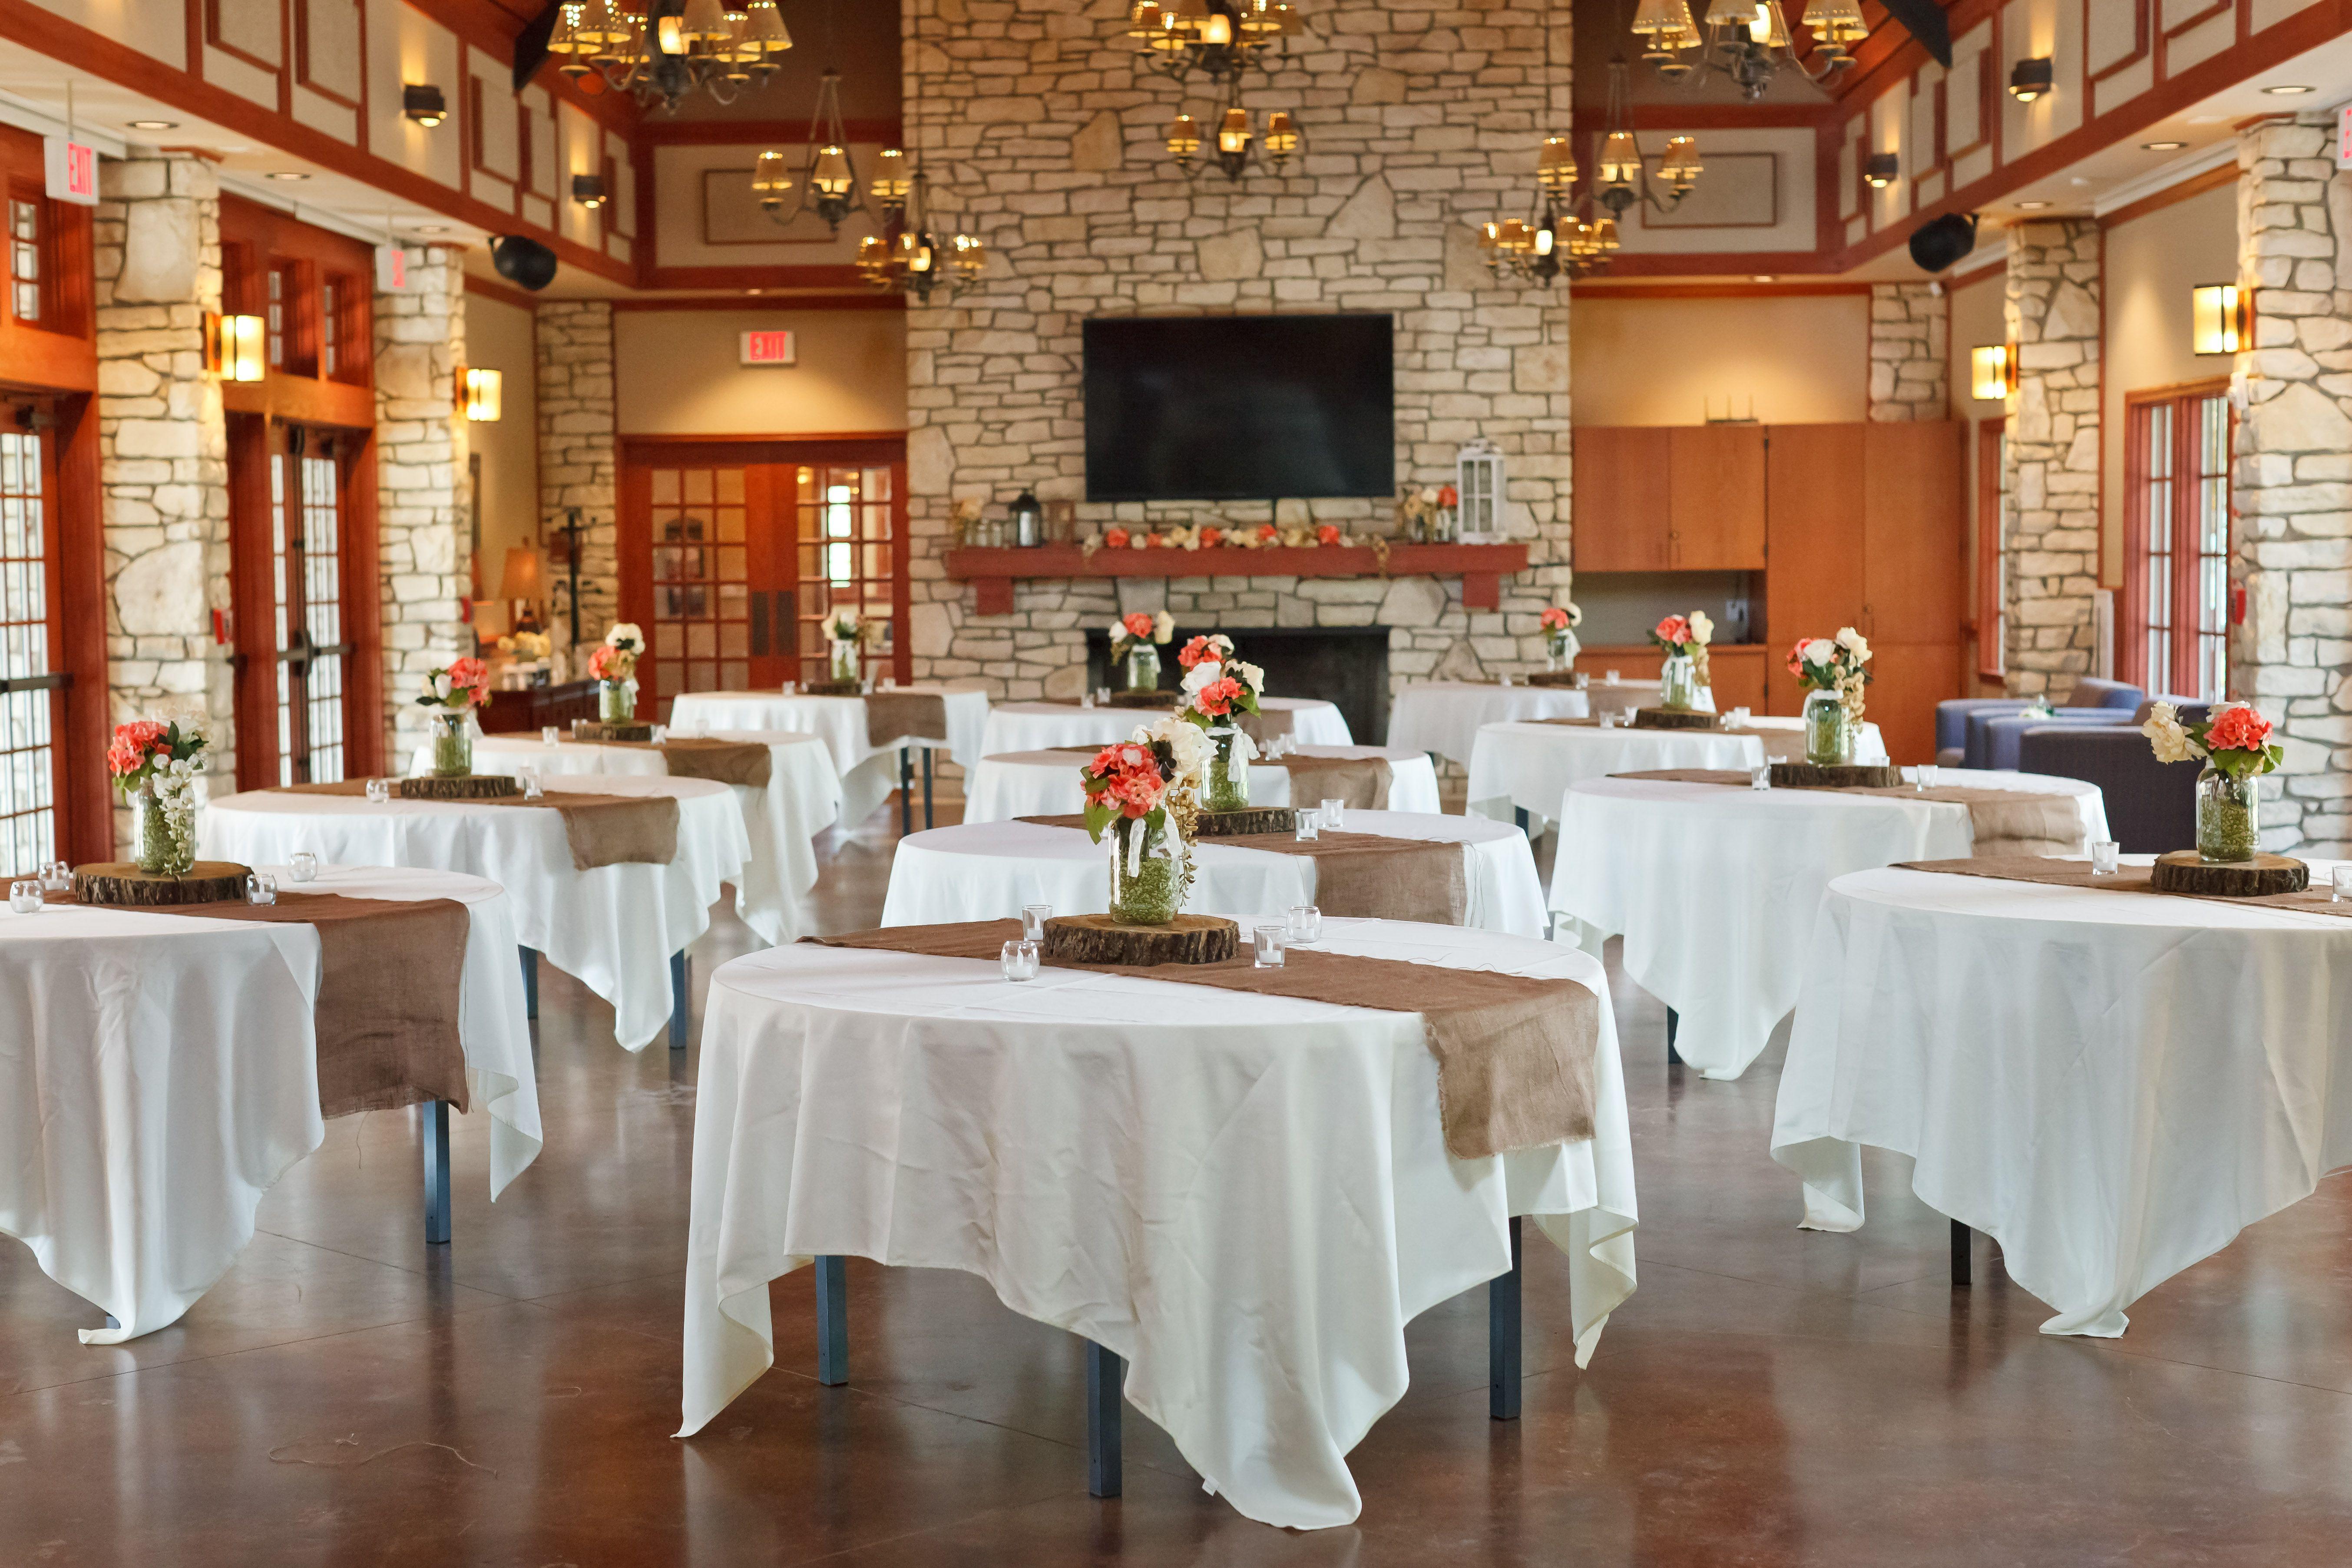 Barnes Restaurant Savannah Georgia - BARN DECOR